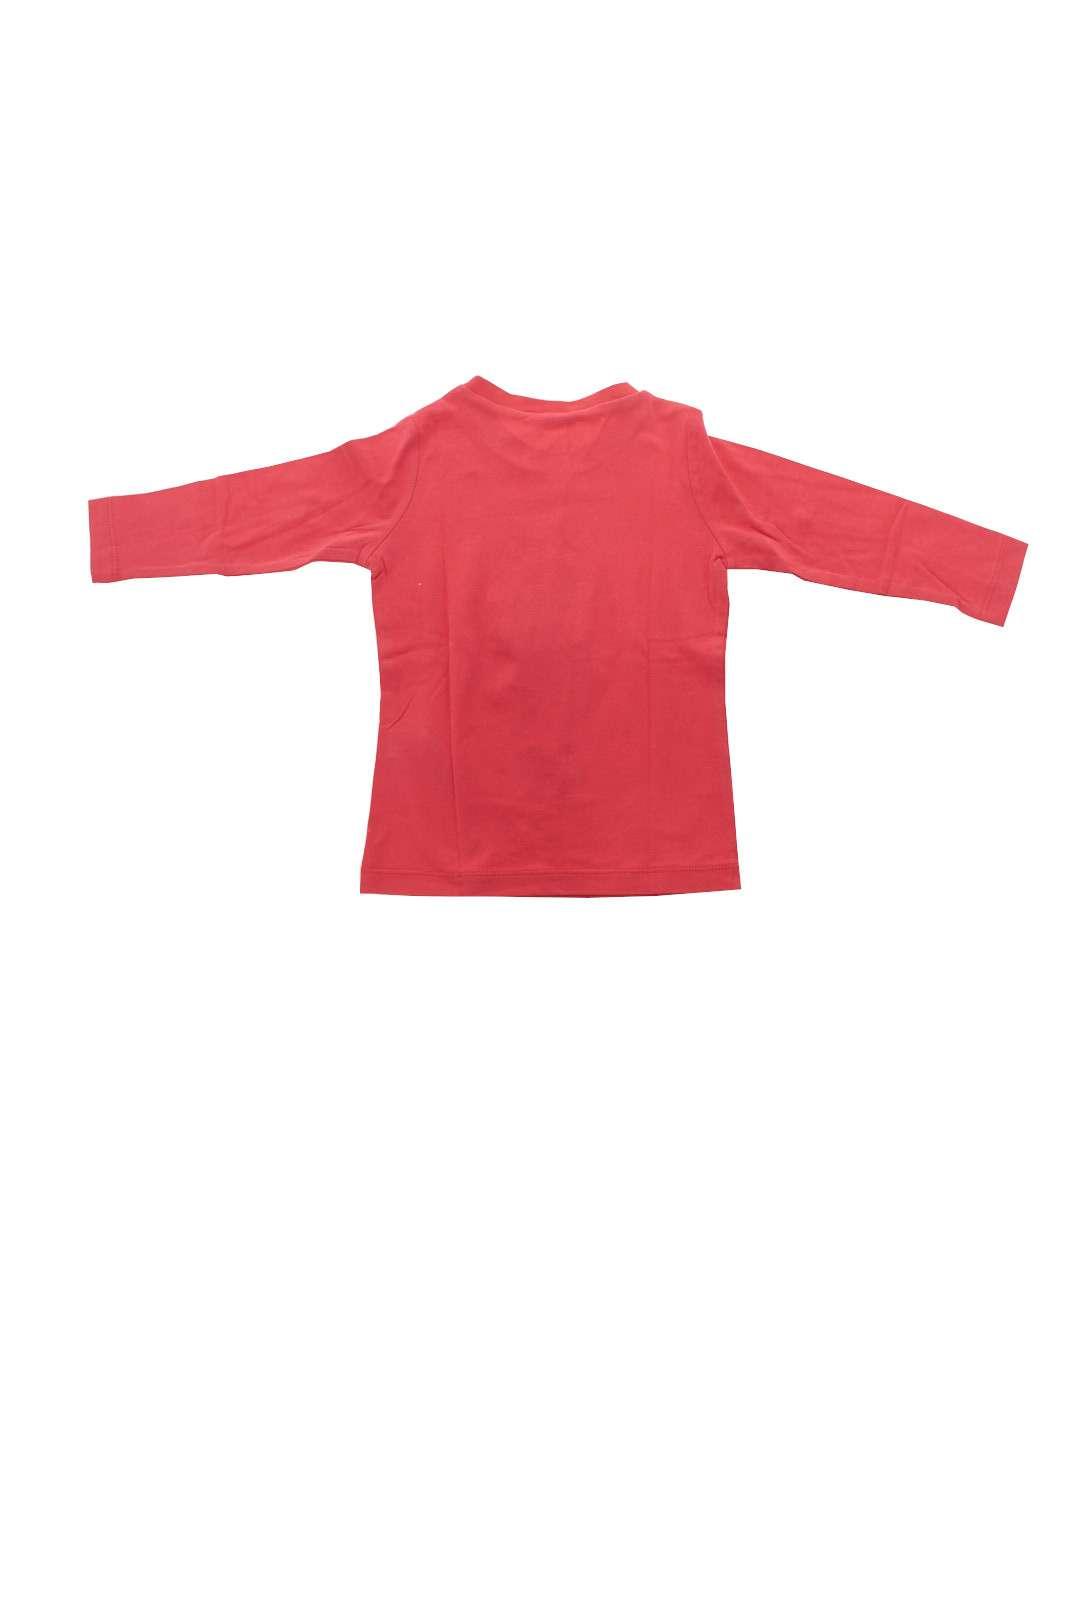 https://www.parmax.com/media/catalog/product/a/i/PE-outlet_parmax-maglia-bambina-Liu-Jo-K65080-B.jpg